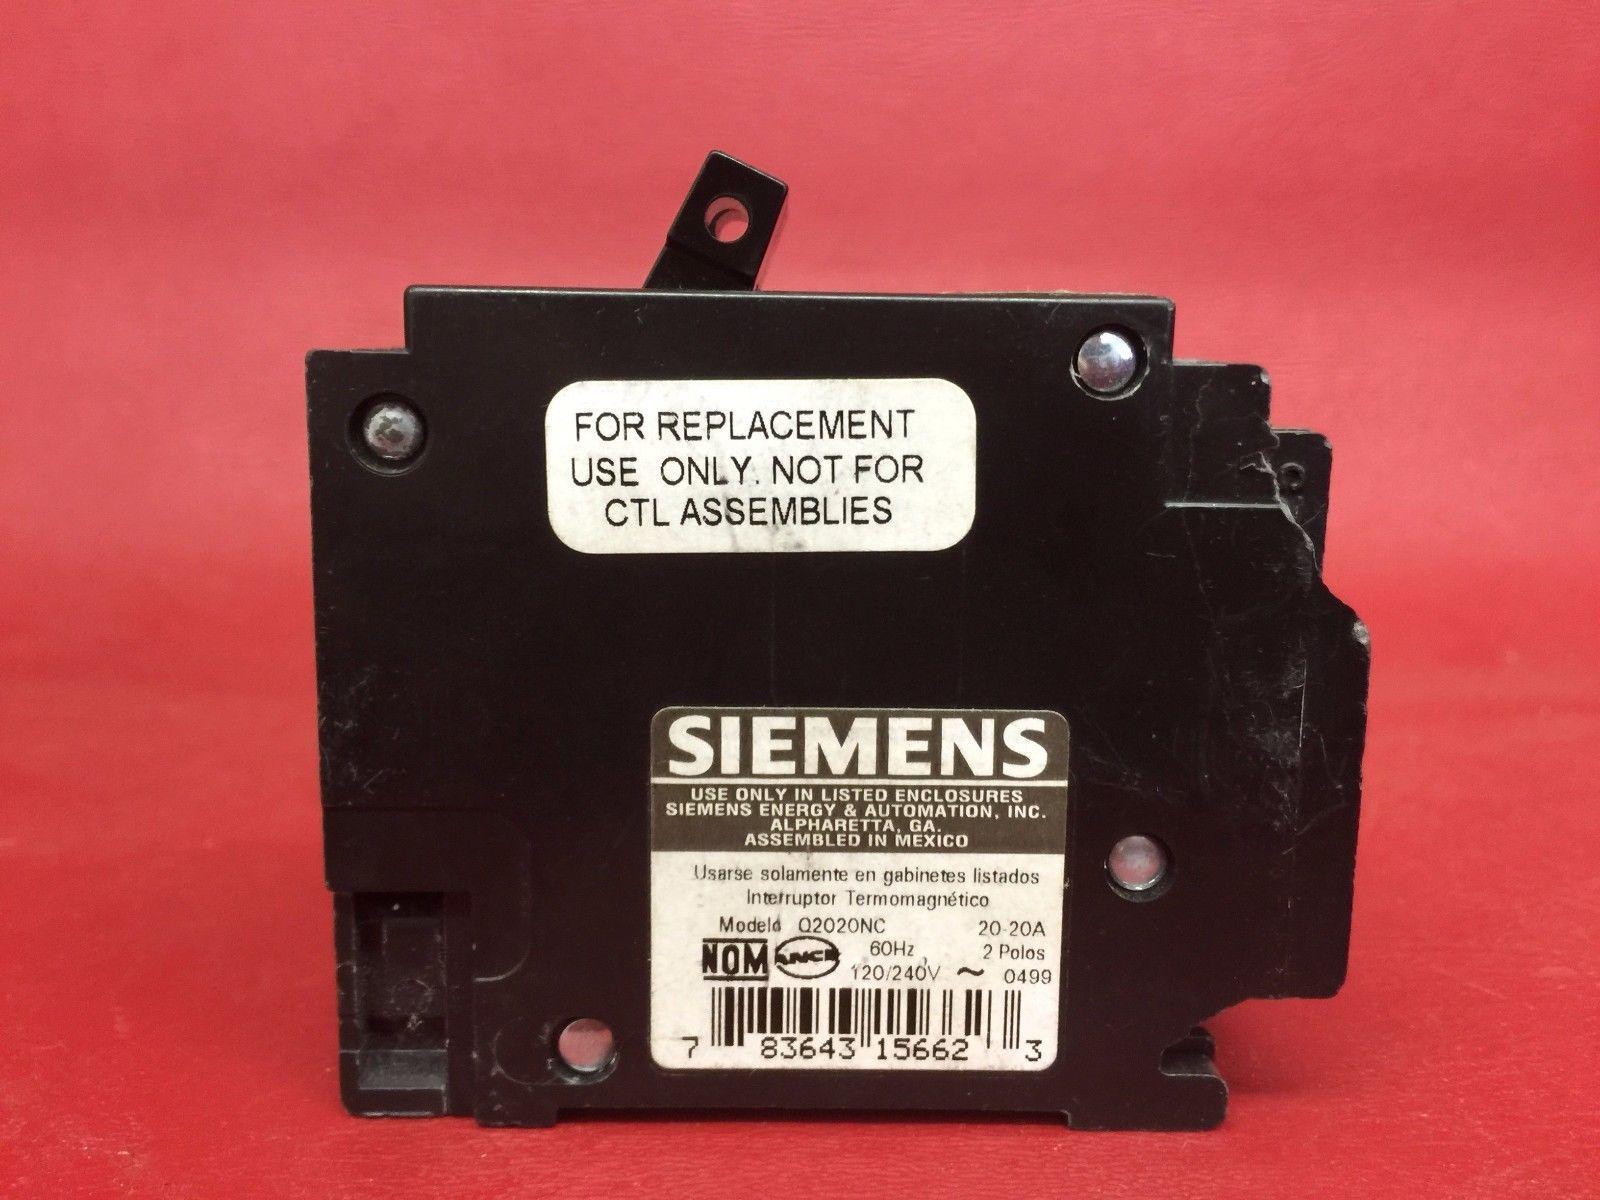 Nett 20 Ampere Buchsenverdrahtung Ideen - Elektrische Schaltplan ...